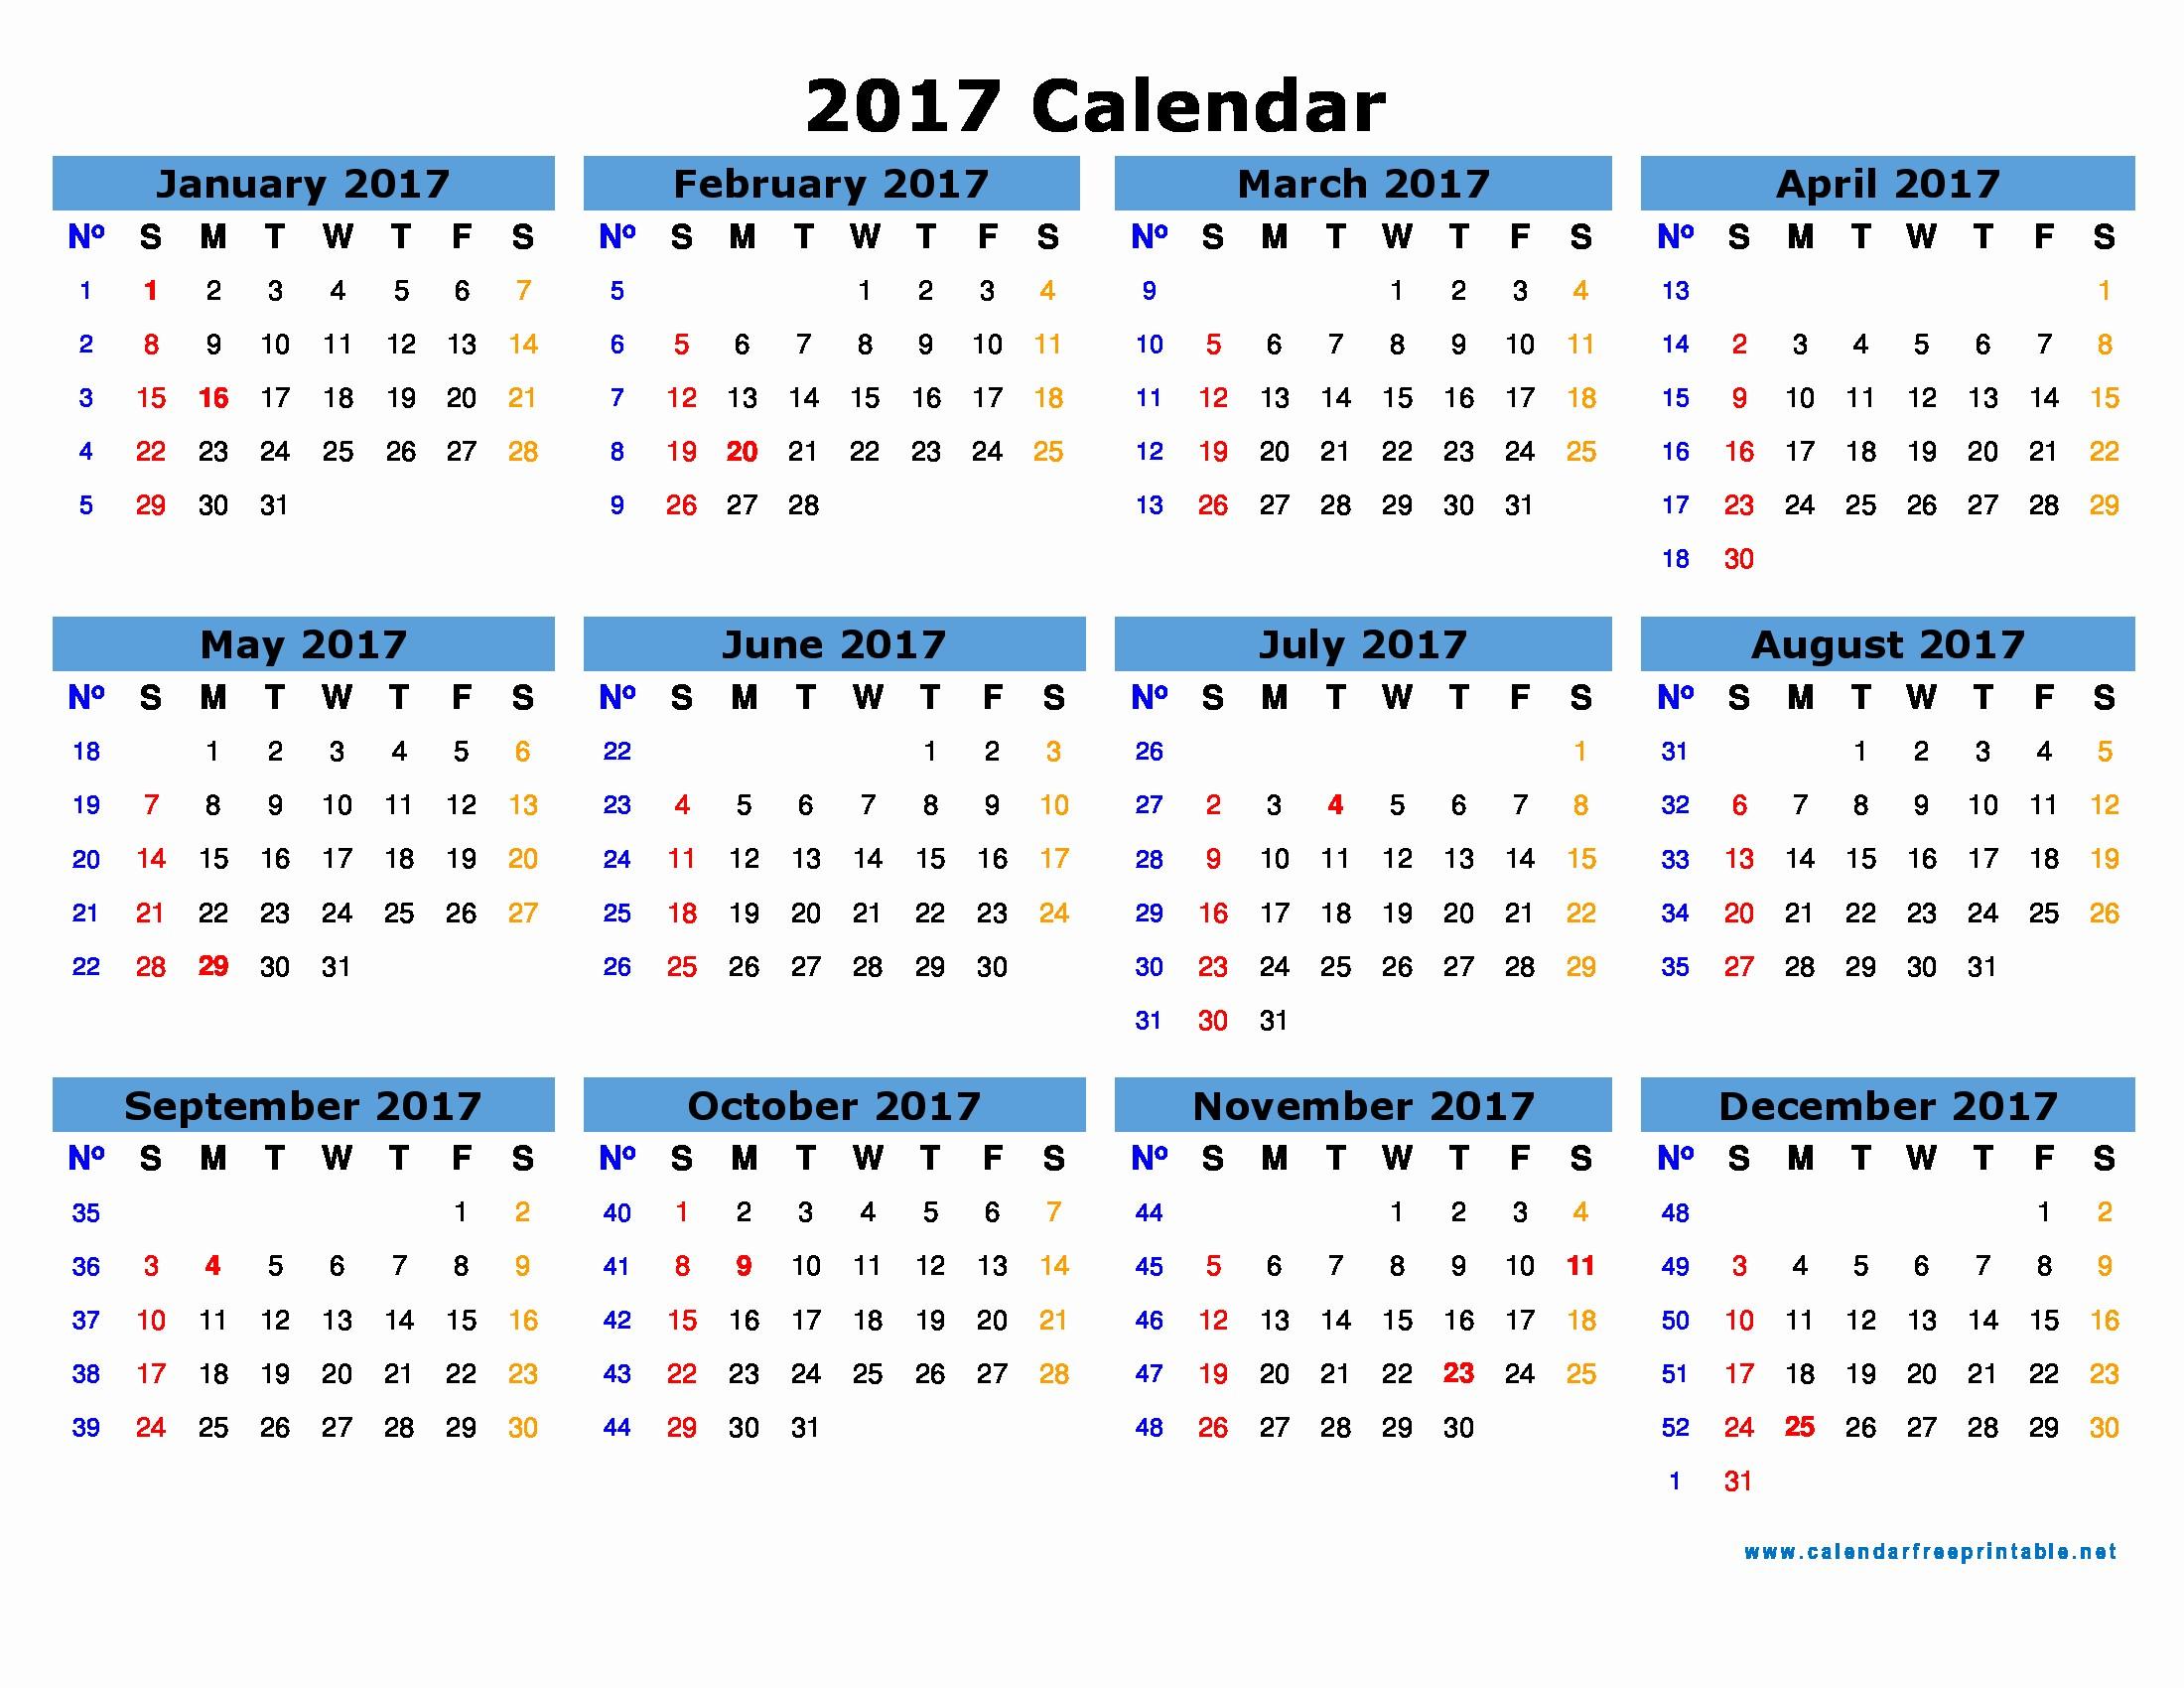 Calendar 2017 Template with Holidays Inspirational 2017 Calendar Printable with Holidays